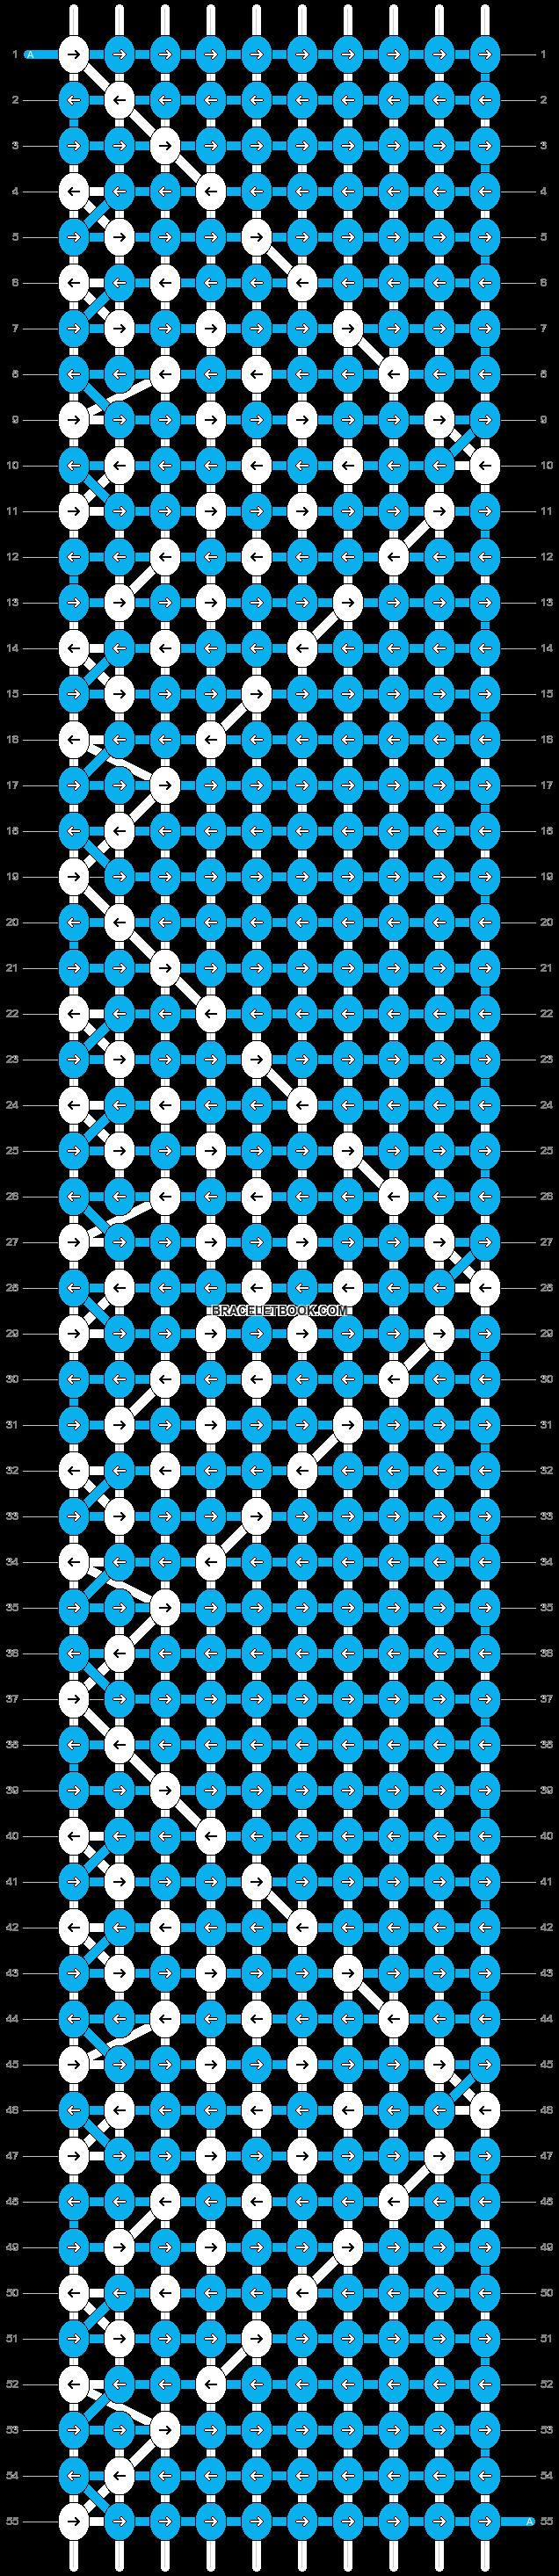 Alpha pattern #9314 pattern